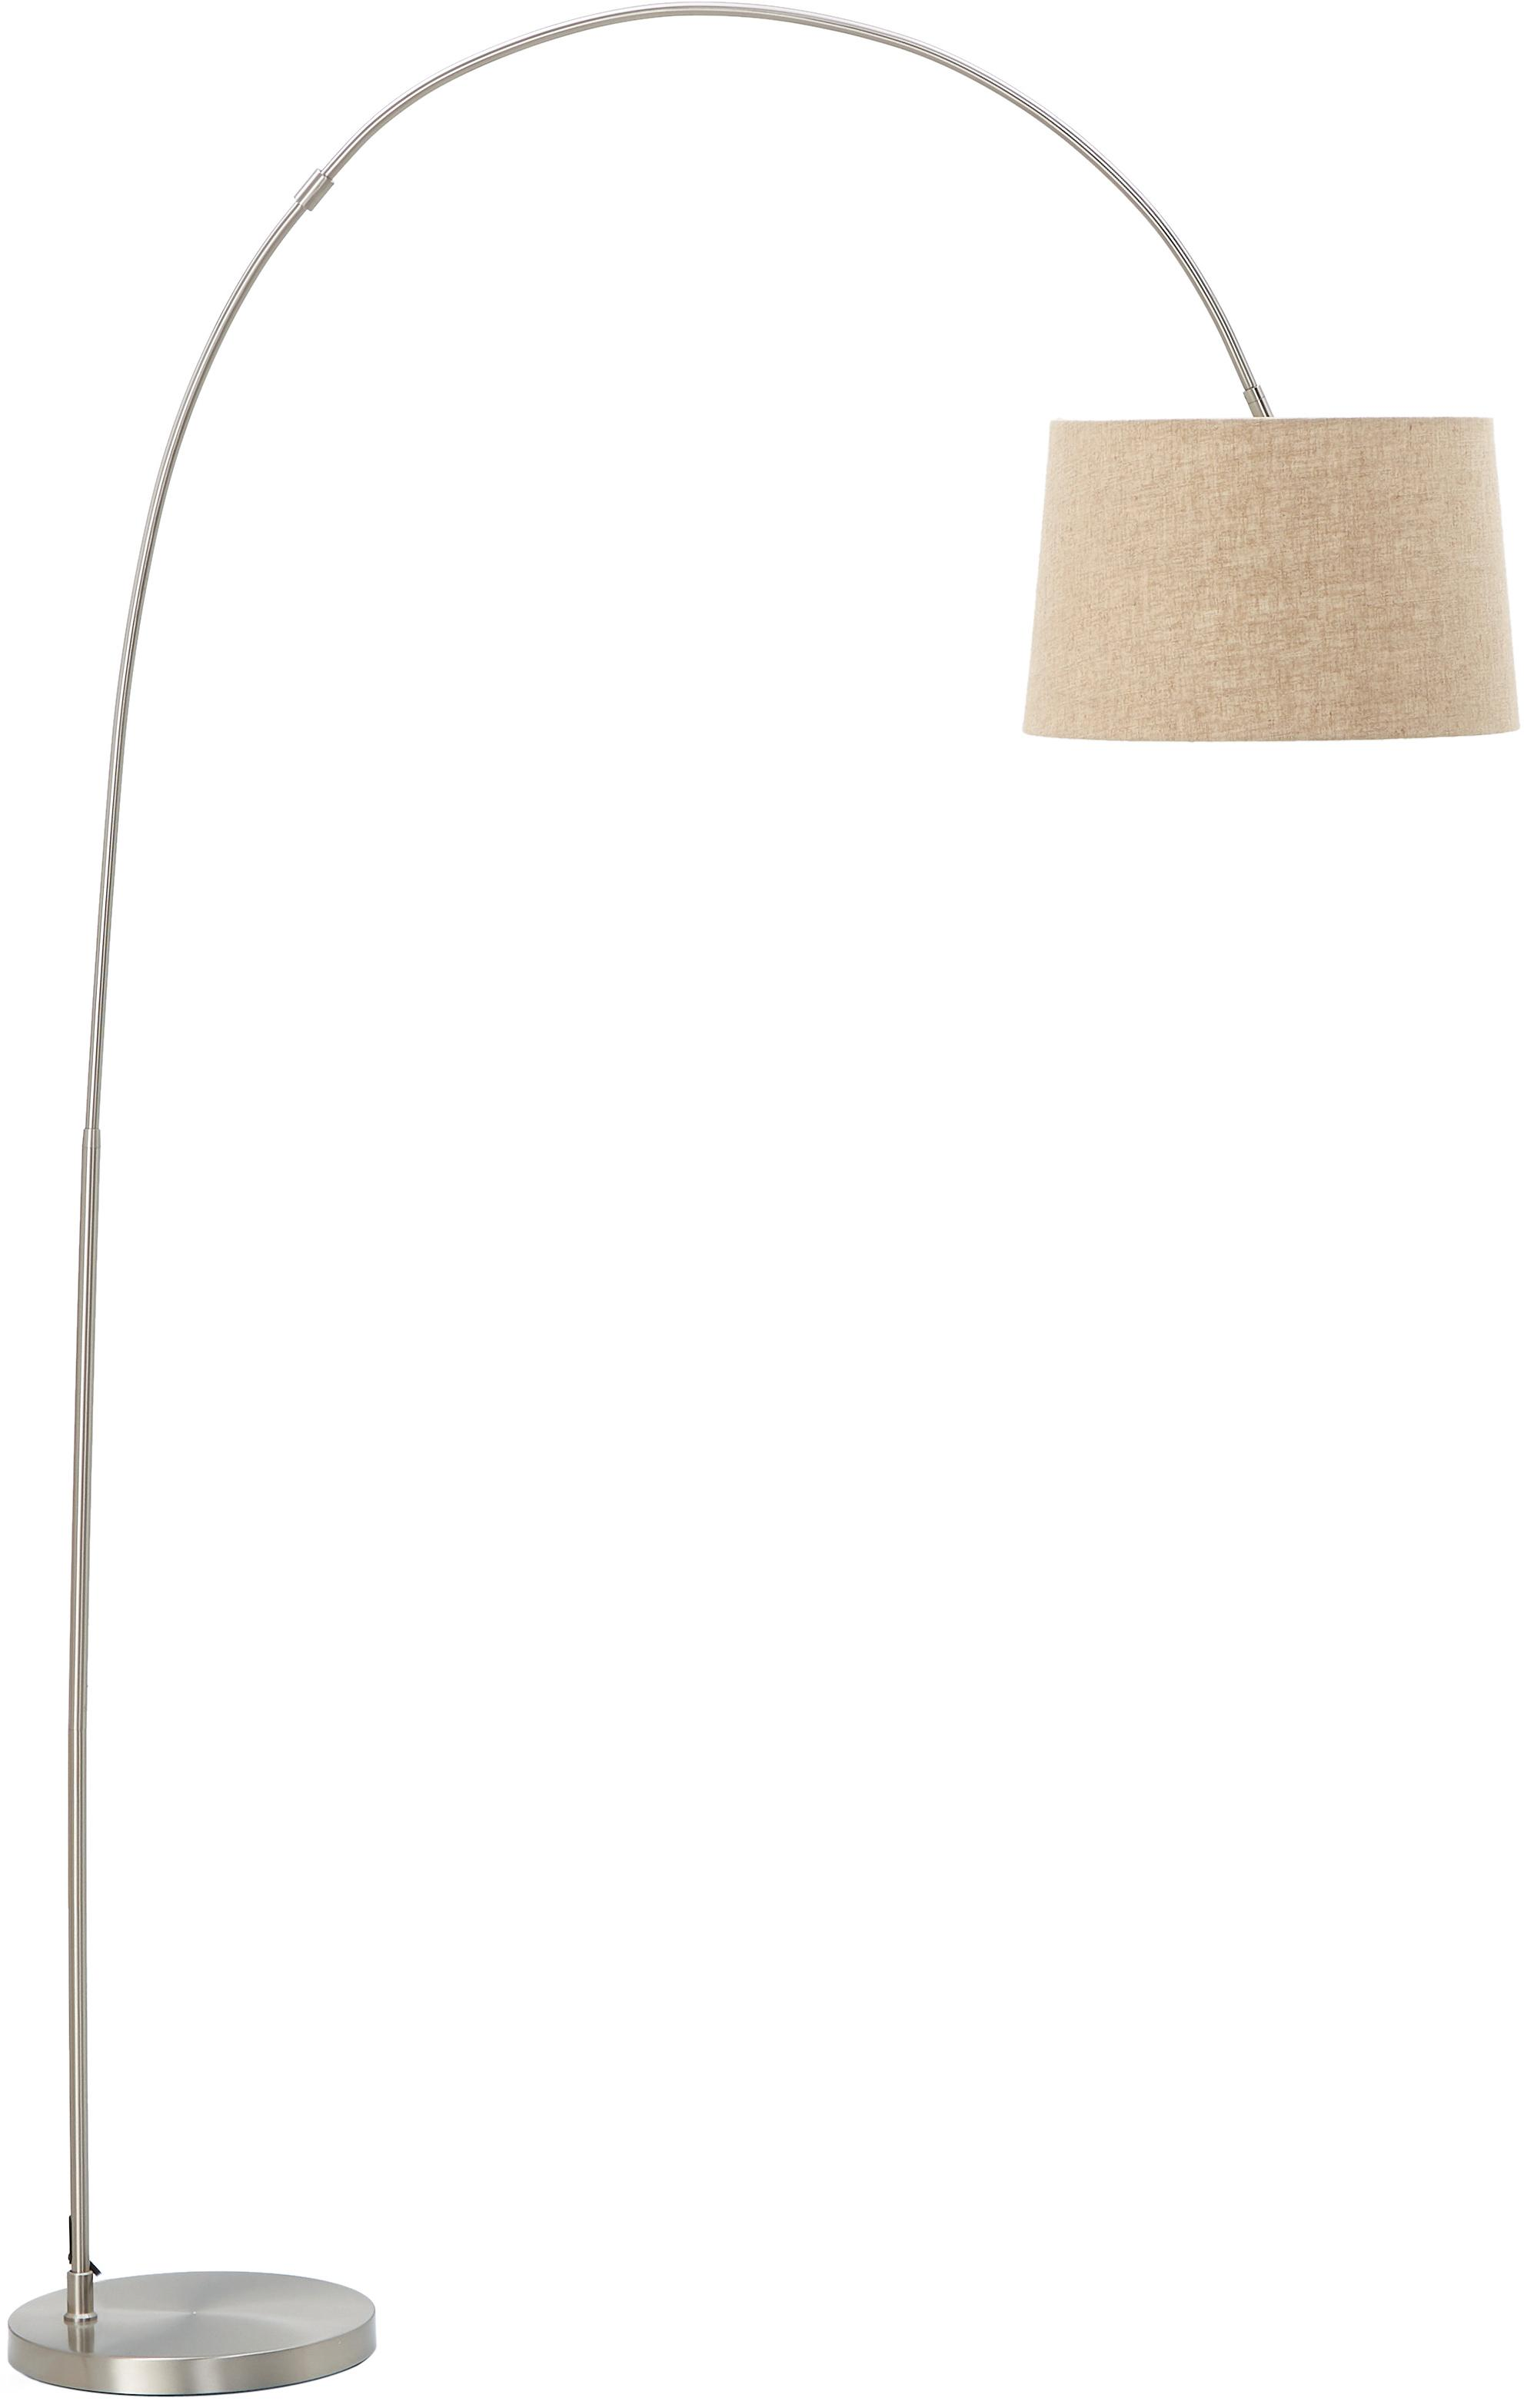 Lámpara arco Laurence, Pantalla: mezcla de algodón, Cable: plástico, Beige, plateado, Ø 40 x Al 188 cm